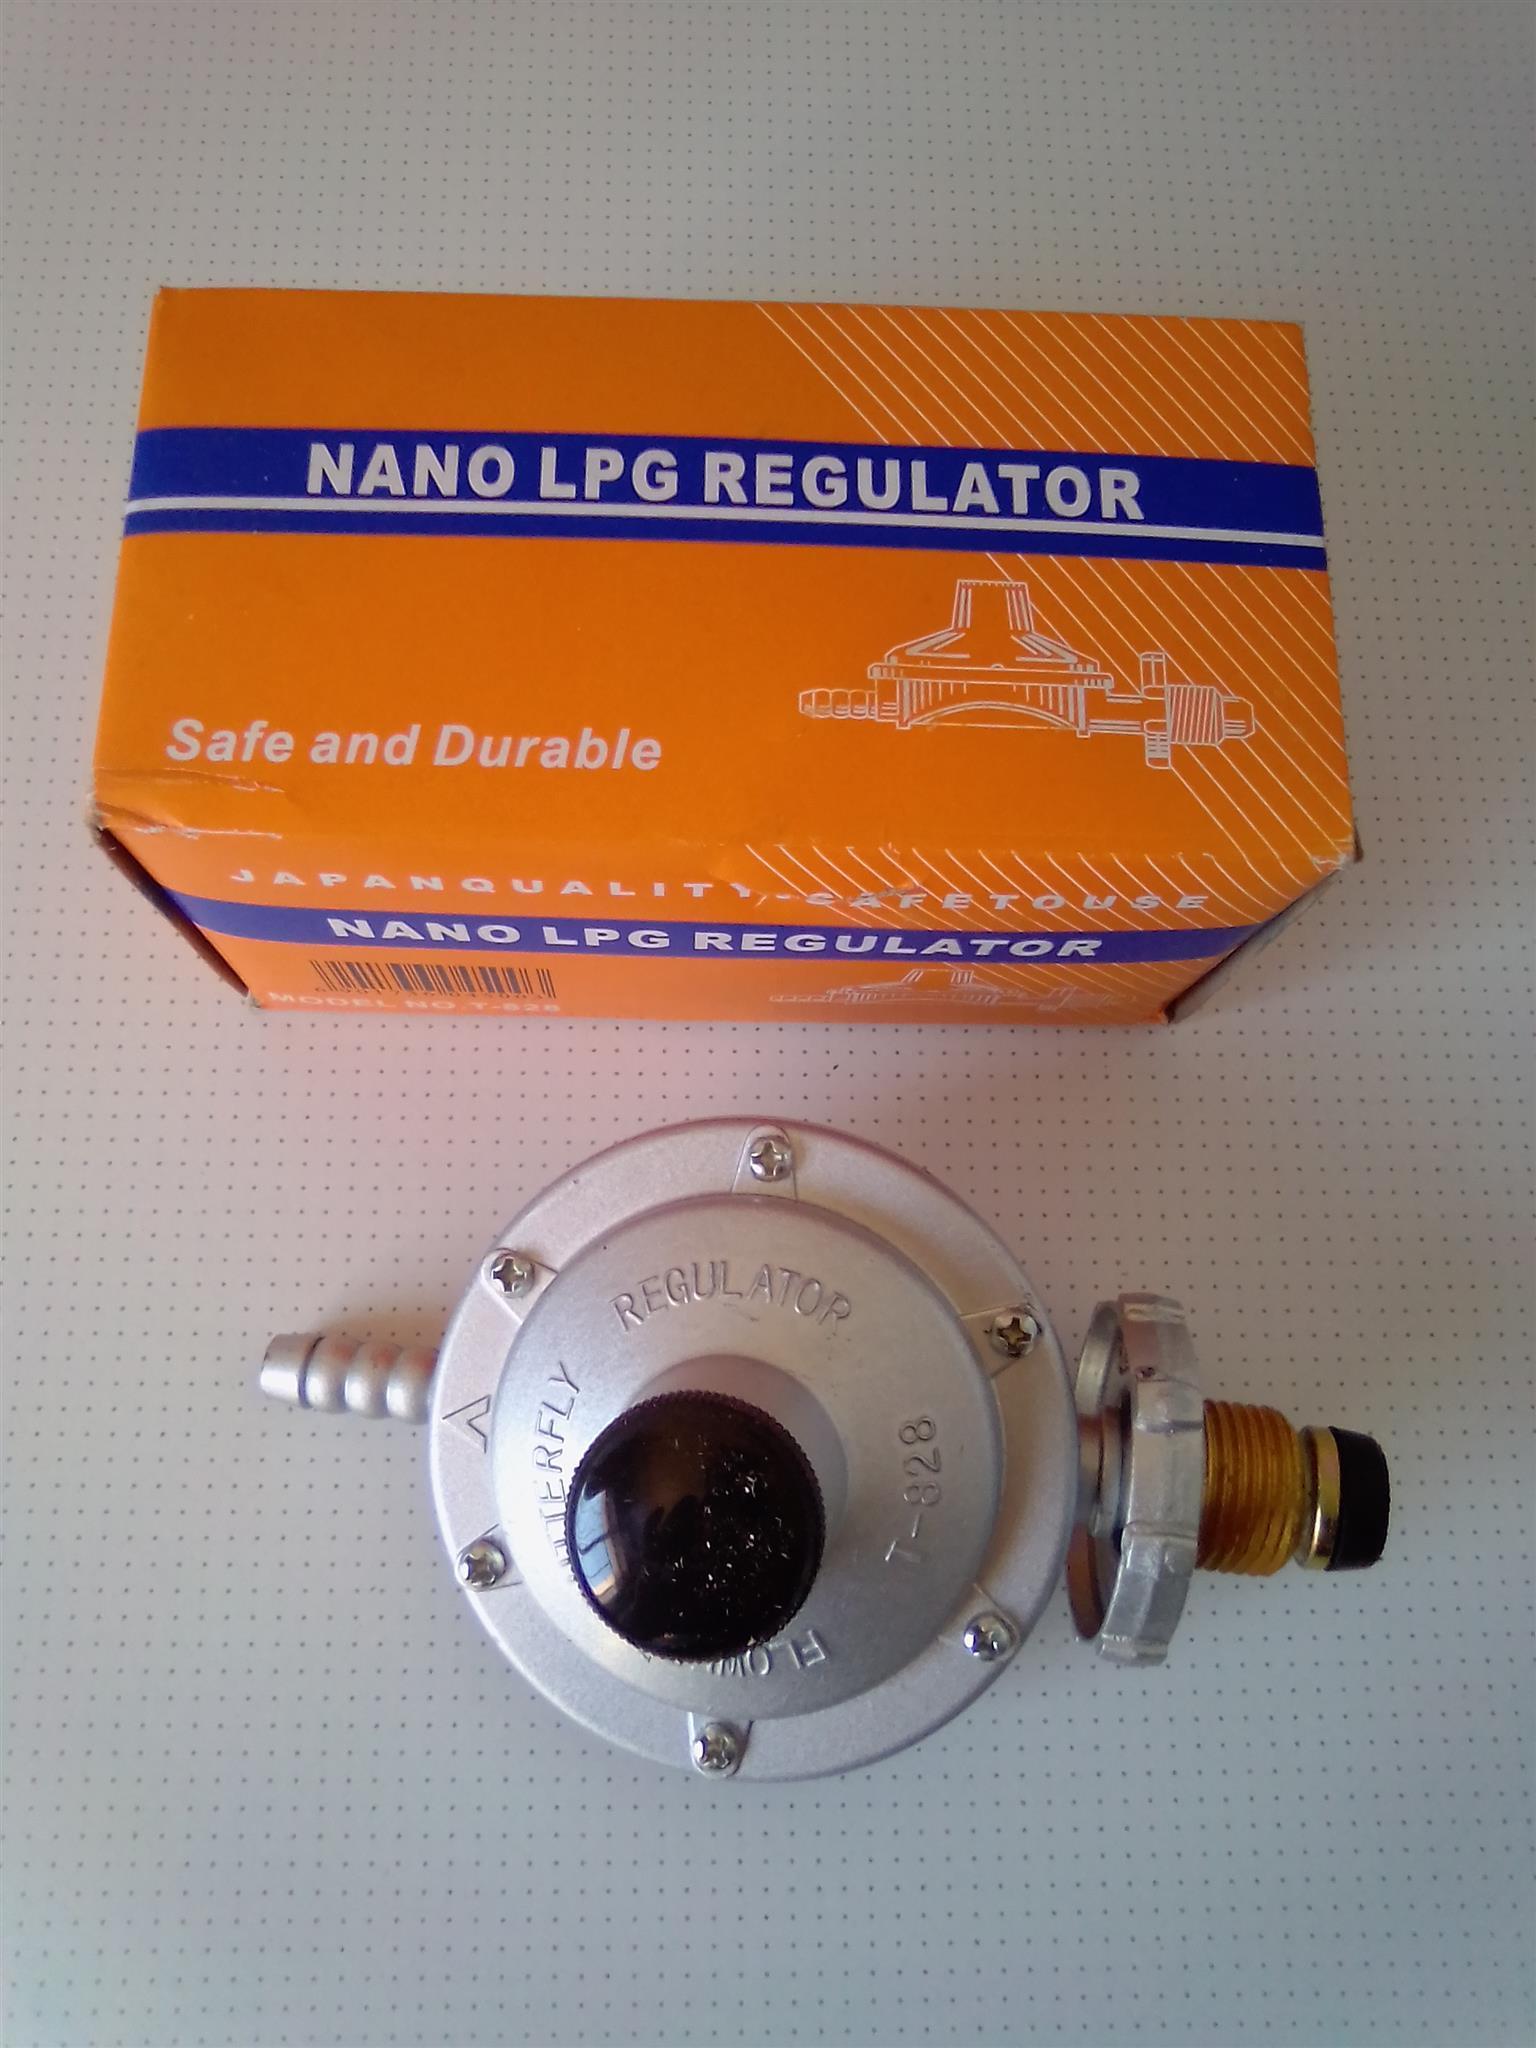 Gas Regulator Nano LPG. Made in Japan. Brand new in a Box.